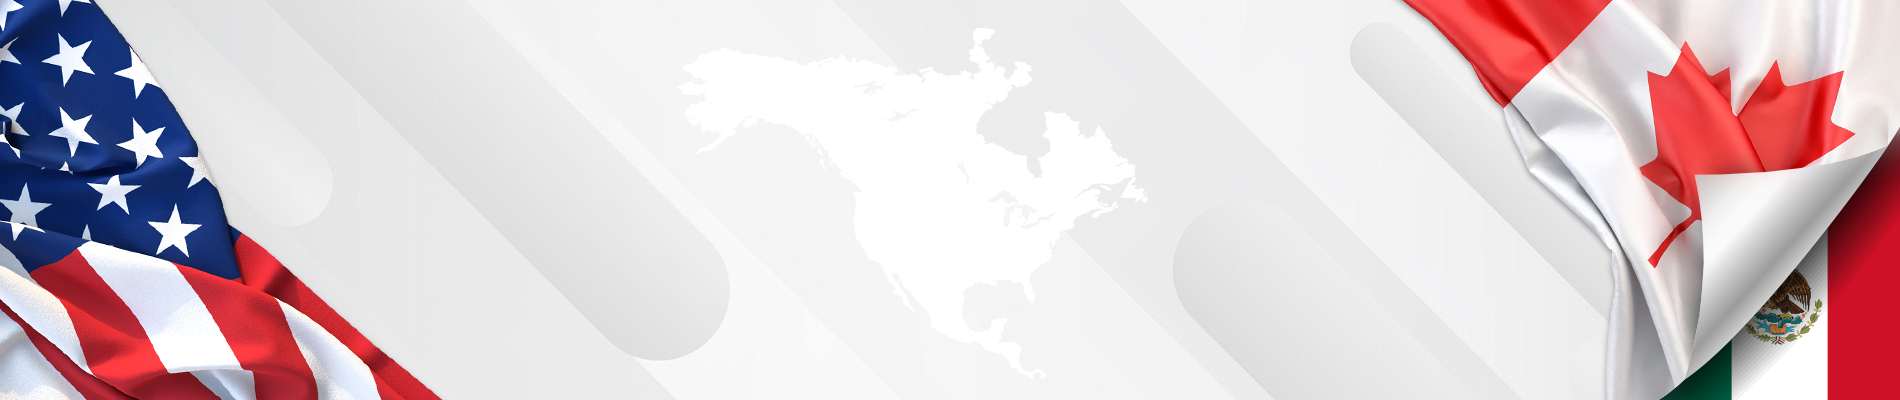 NAFTA/Free Trade Agreement